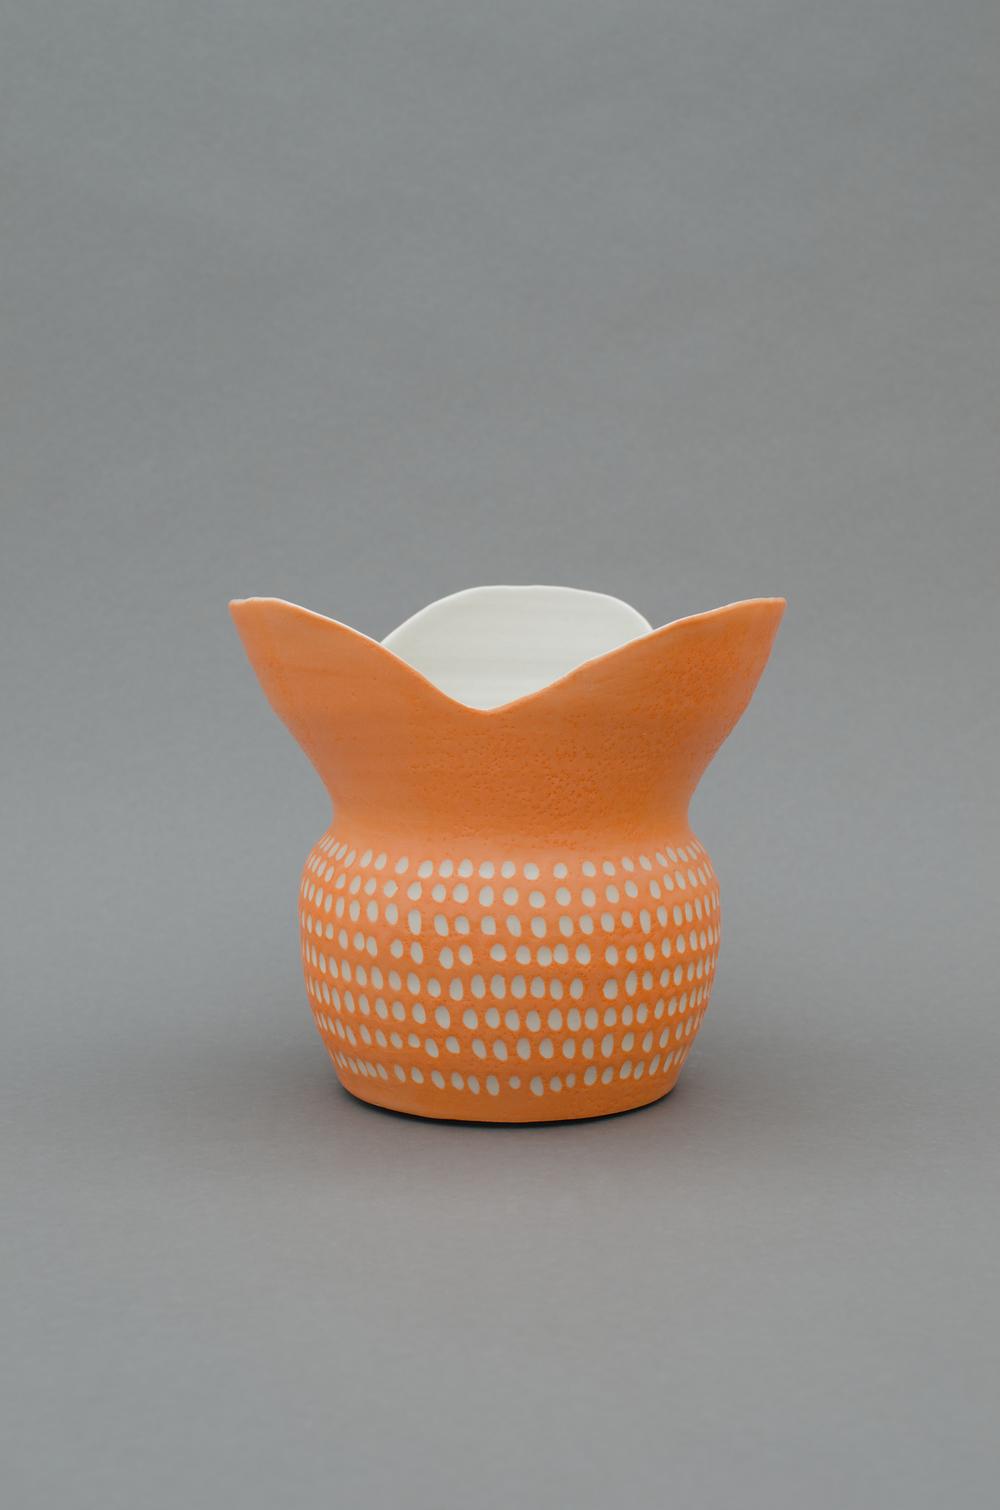 Shio Kusaka  Untitled (orange 8)  2013 Porcelain 7 1/2h x 7 7/8w x 7 7/8d in SK400